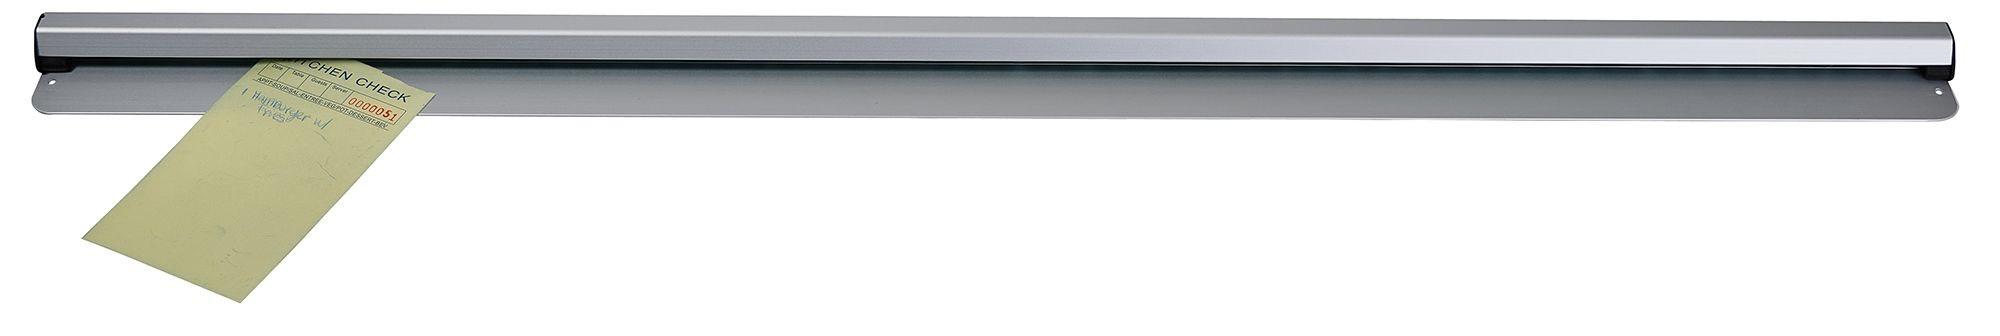 "Winco ODR-36N Aluminum Order Rack 36"""